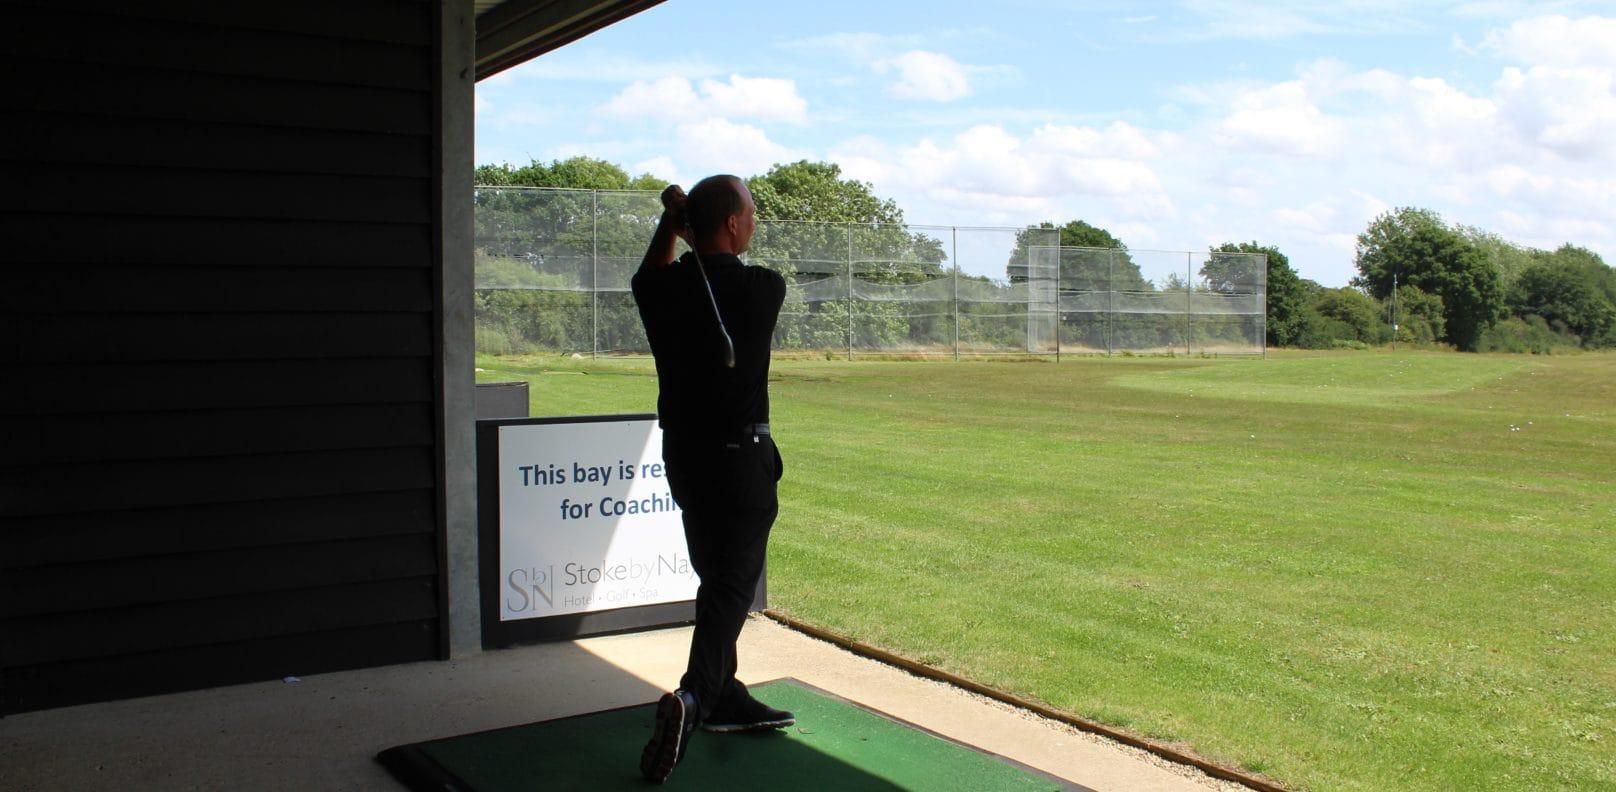 golf - Driving Range Stoke by Nayland Essex